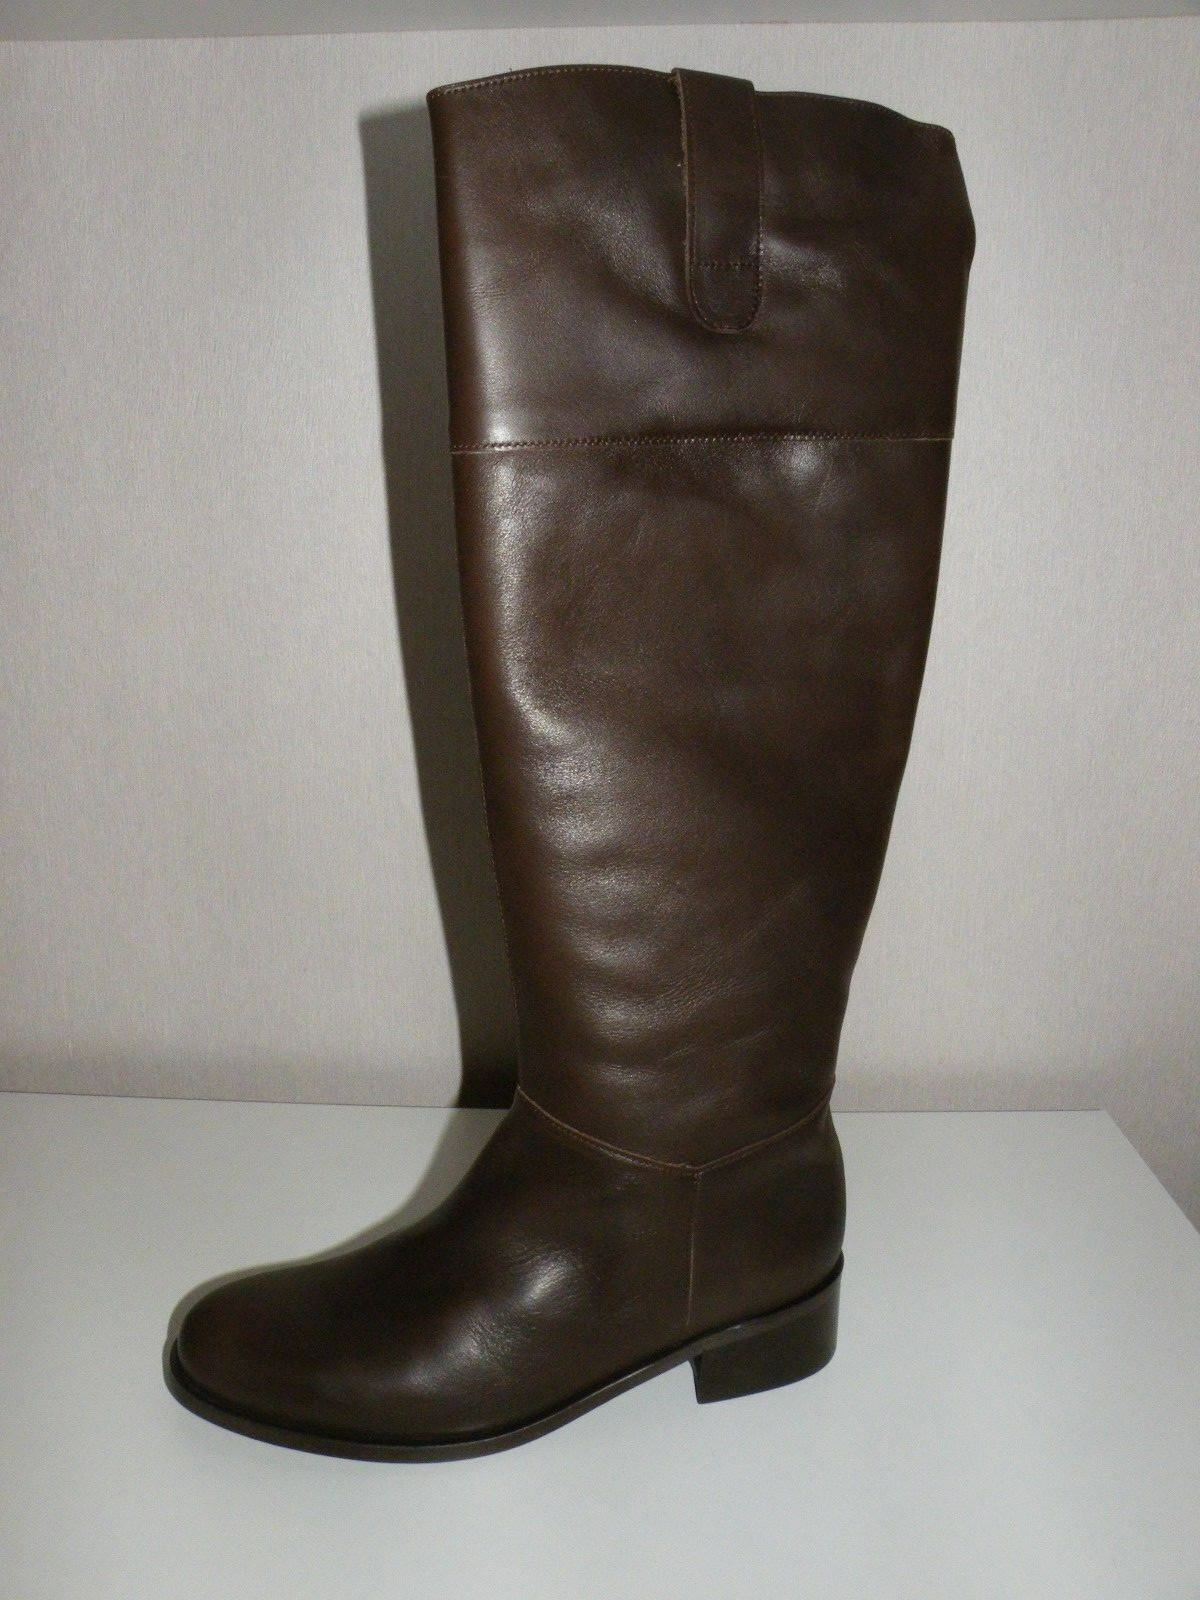 B.C. Best Connections Stiefel Gr. Schuhe 40 braun Damen Schuhe Gr. 51bc0b